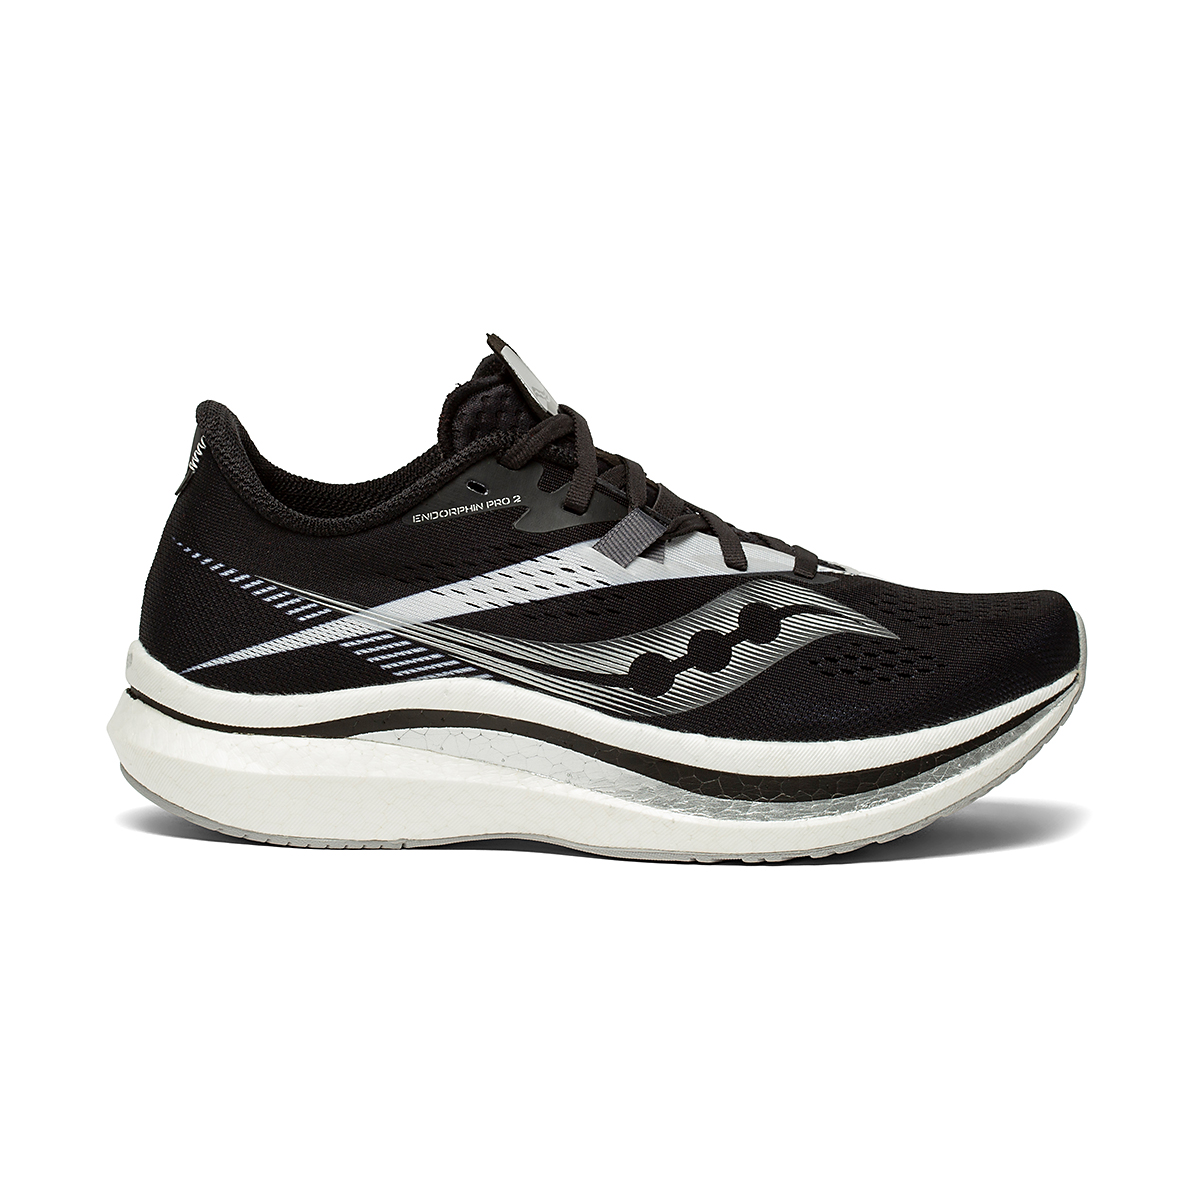 Women's Saucony Endorphin Pro 2 Running Shoe - Color: Black/White - Size: 5 - Width: Regular, Black/White, large, image 1